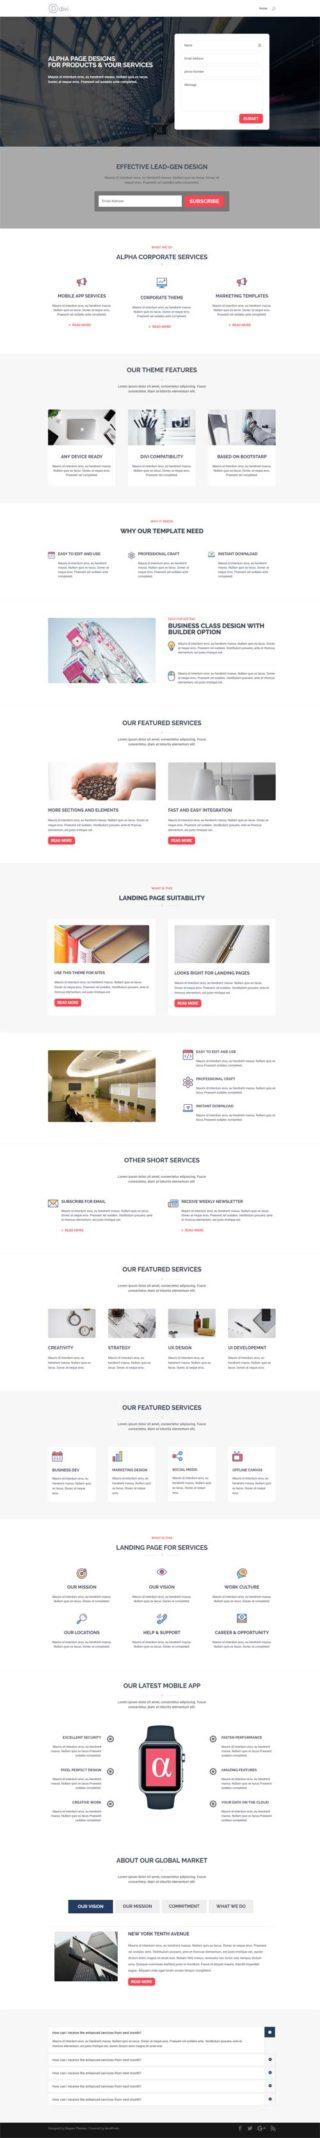 resume cv 1 page layout